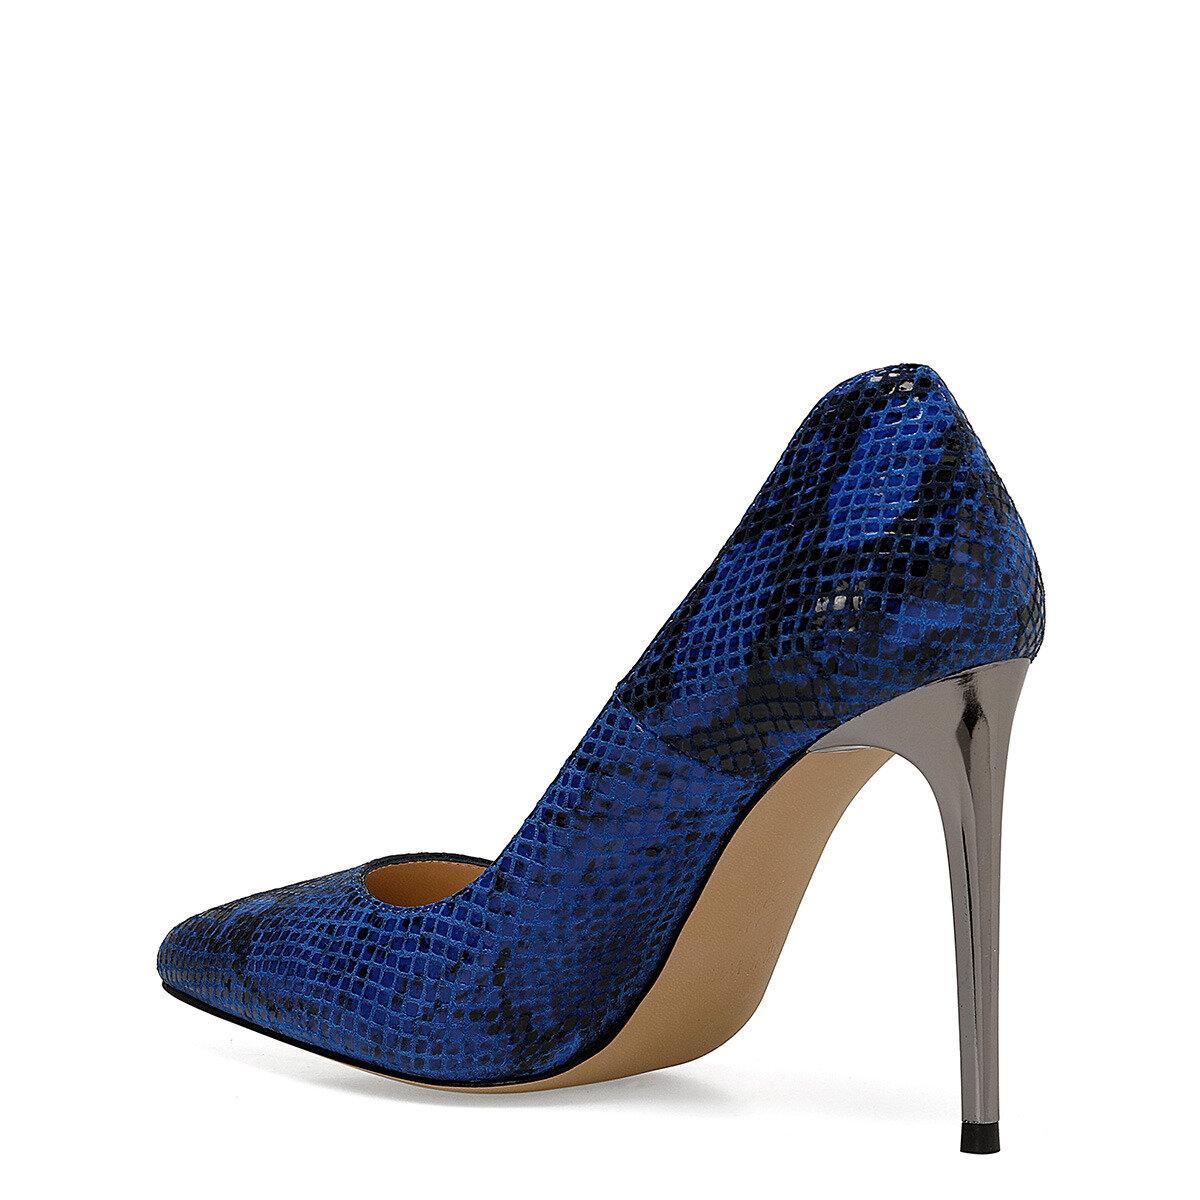 TALIS Mavi Kadın Stiletto